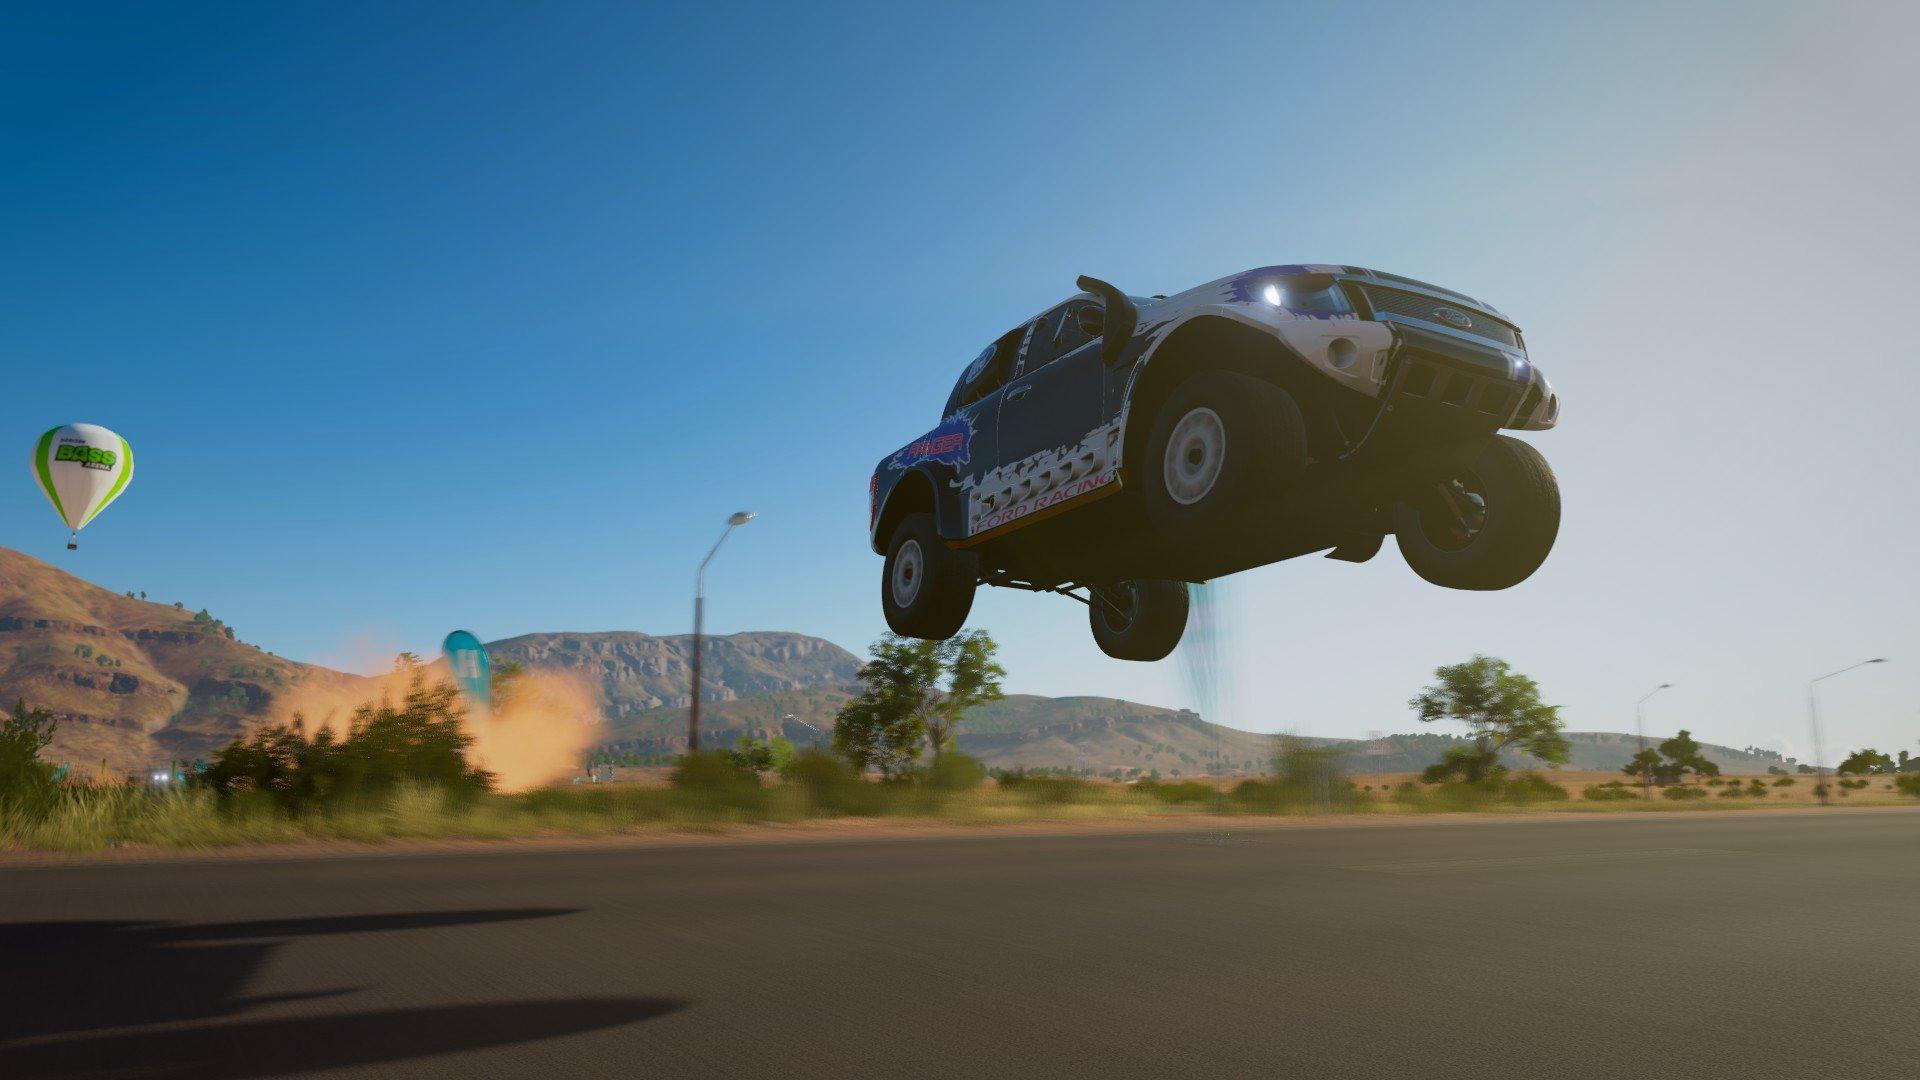 forza horizon 3, Rallye, Video games Wallpaper